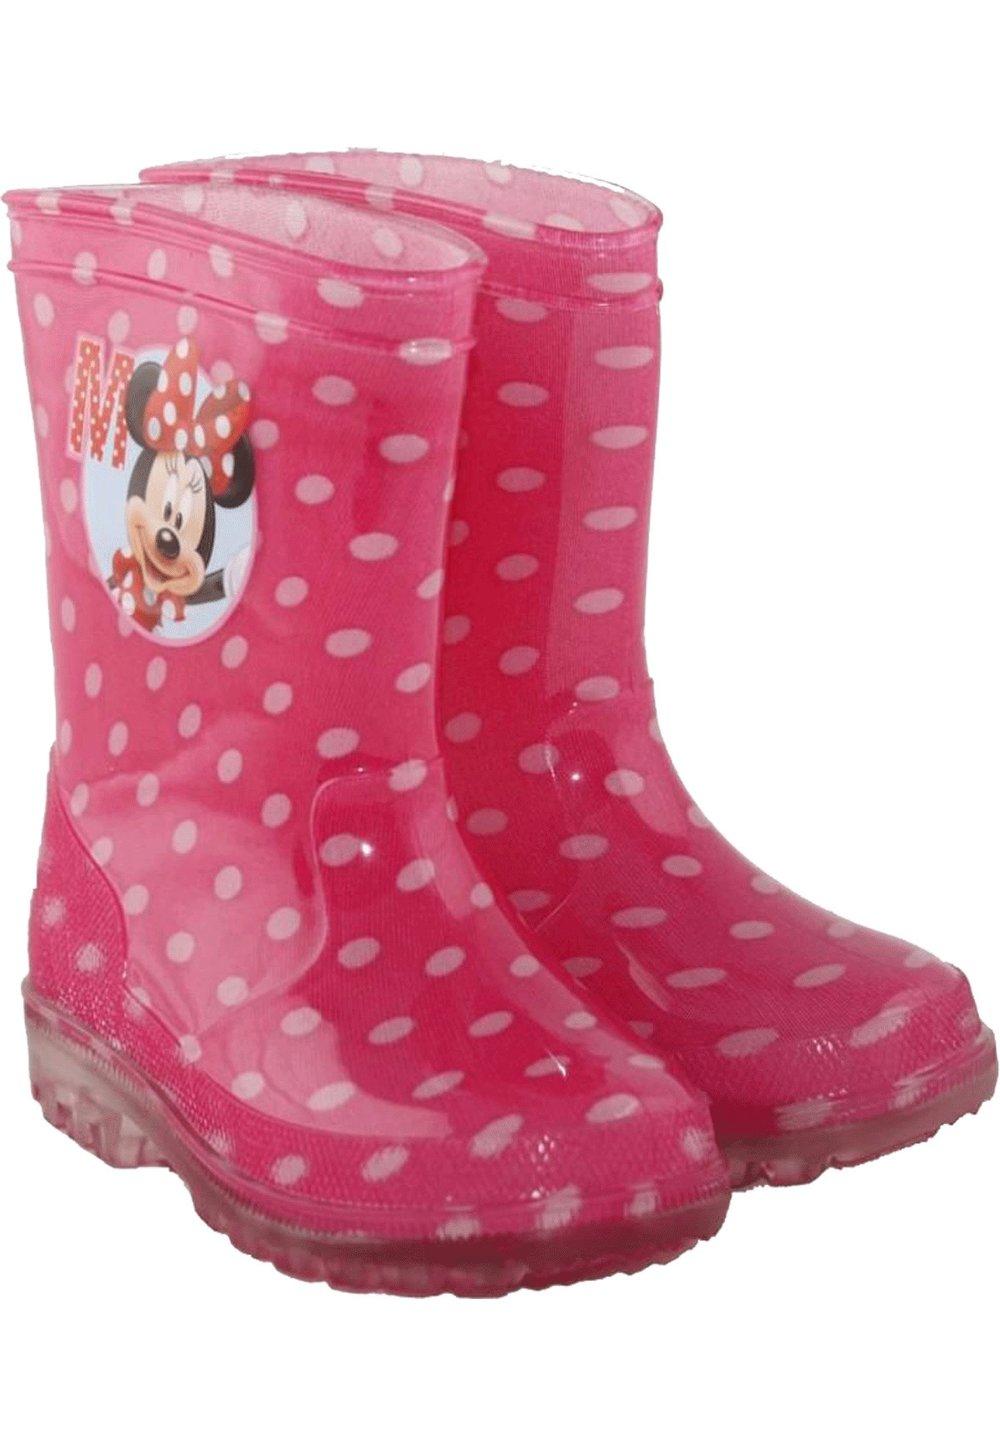 Cizme de cauciuc, Minnie Mouse, roz cu buline albe imagine